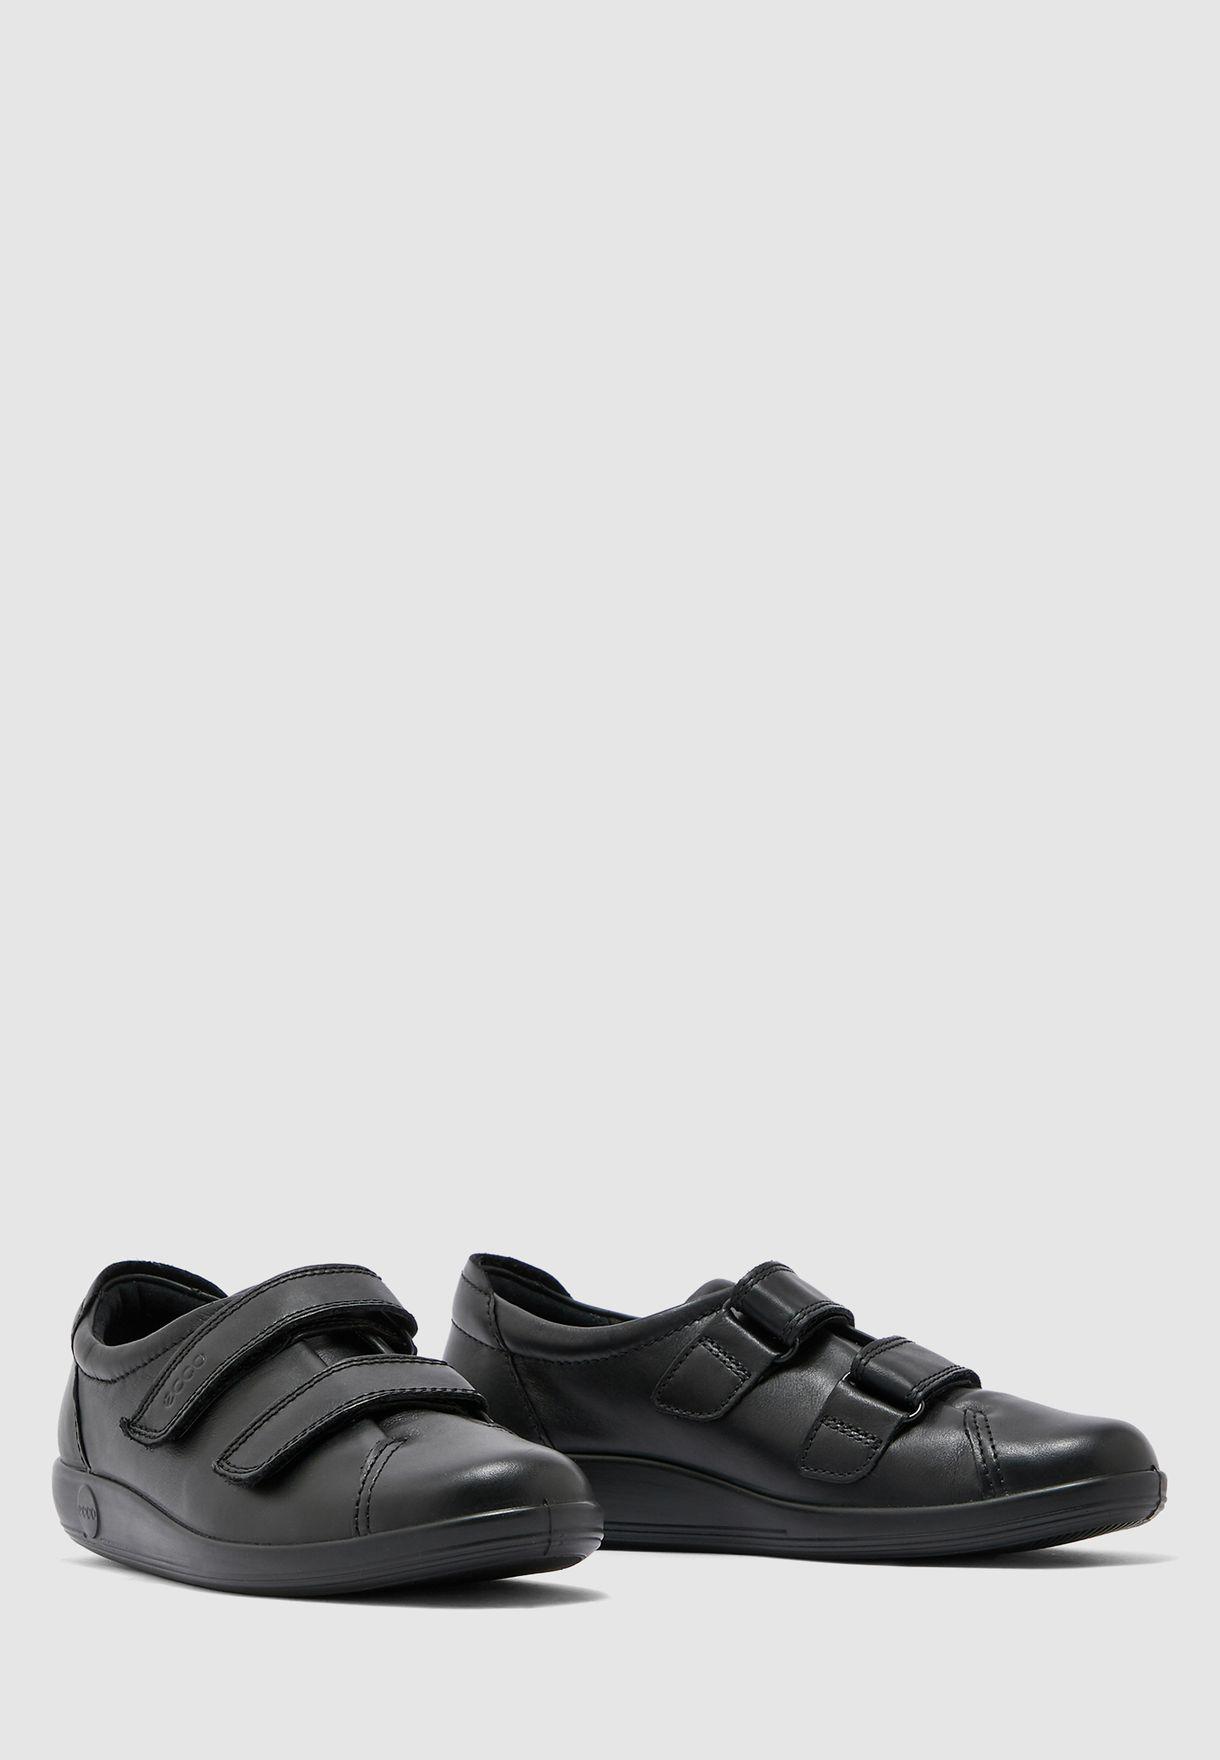 Ecco Soft Strap Slip On - Black